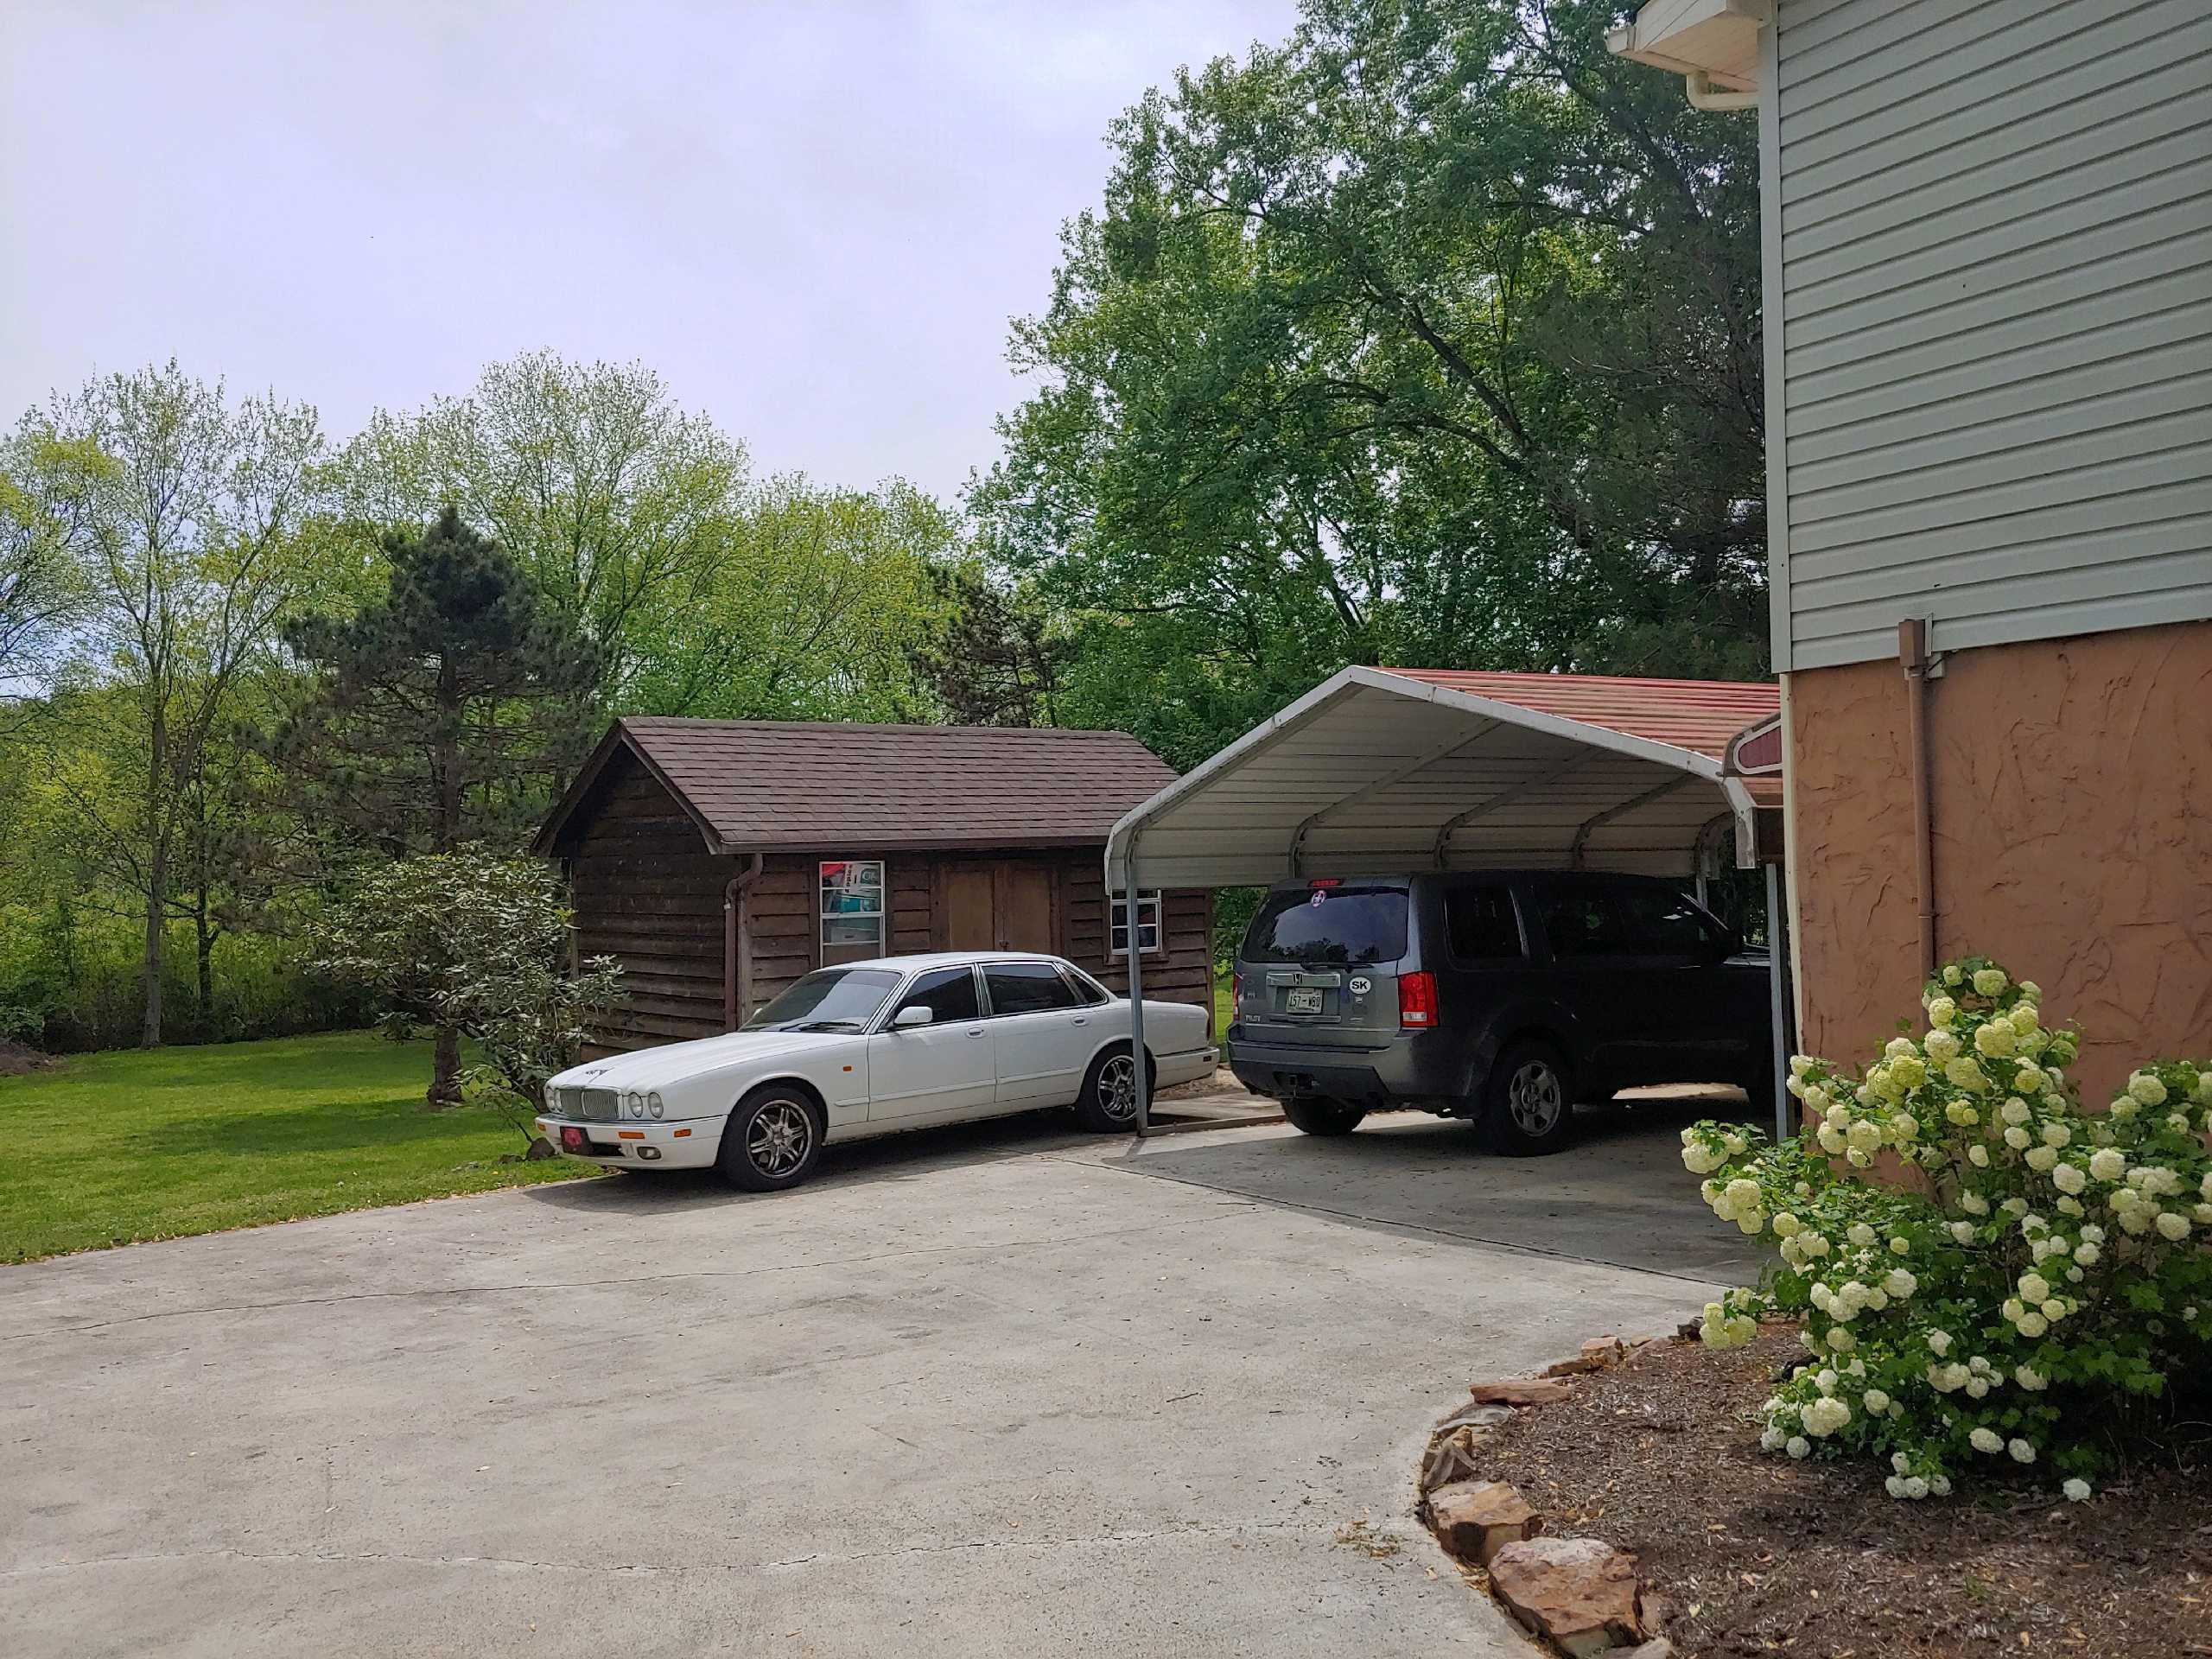 1261 Apple Creek Drive Drive, Louisville, Tennessee 37777, 3 Bedrooms Bedrooms, ,3 BathroomsBathrooms,Single Family,For Sale,Apple Creek Drive,1080284